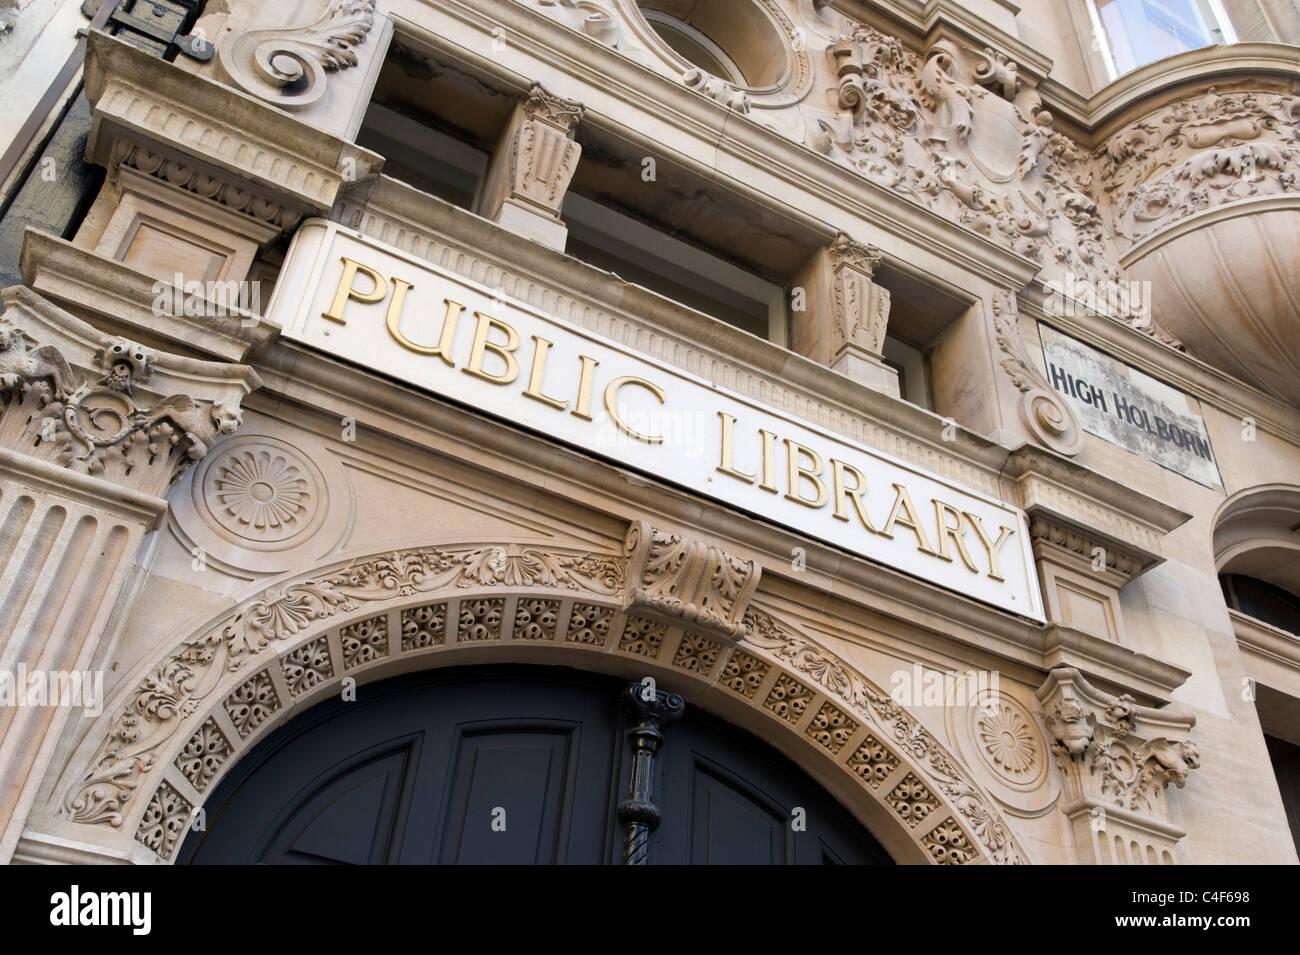 Public library on High Holborn, London, UK - Stock Image